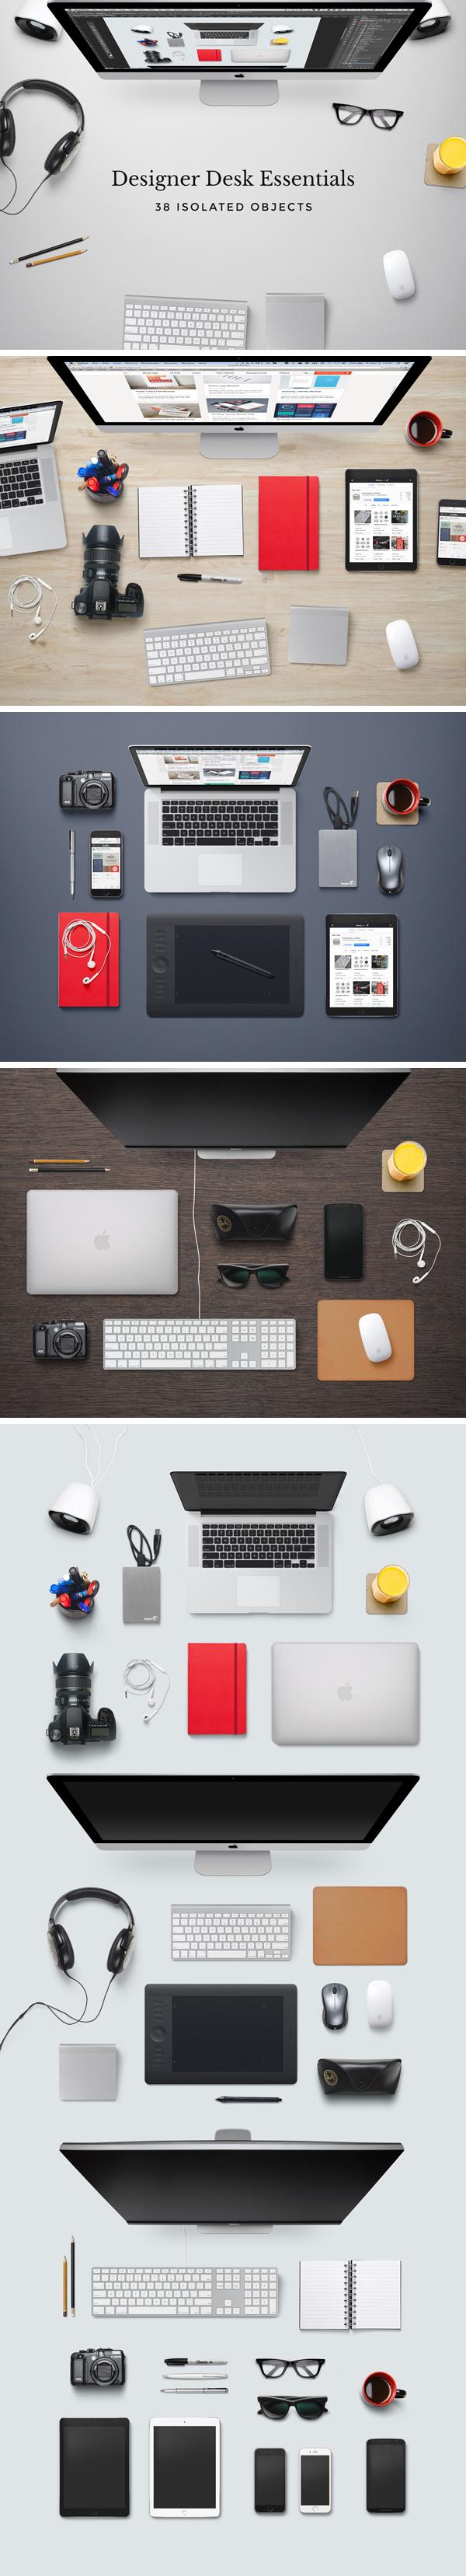 Designer Desk Essentials   GraphicBurger